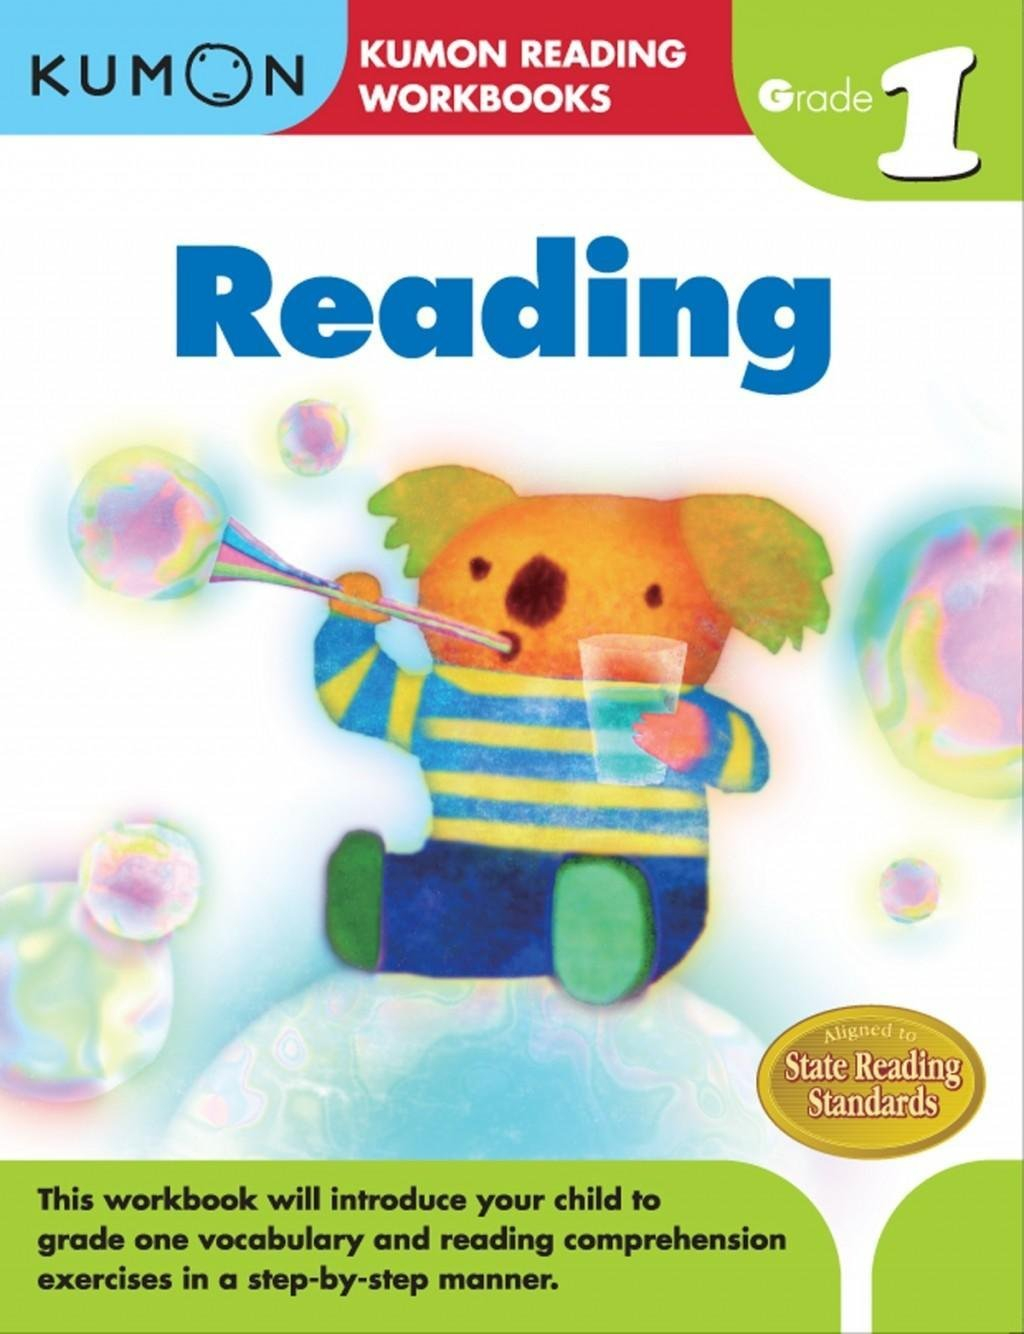 Kumon Reading Worksheets Free Download